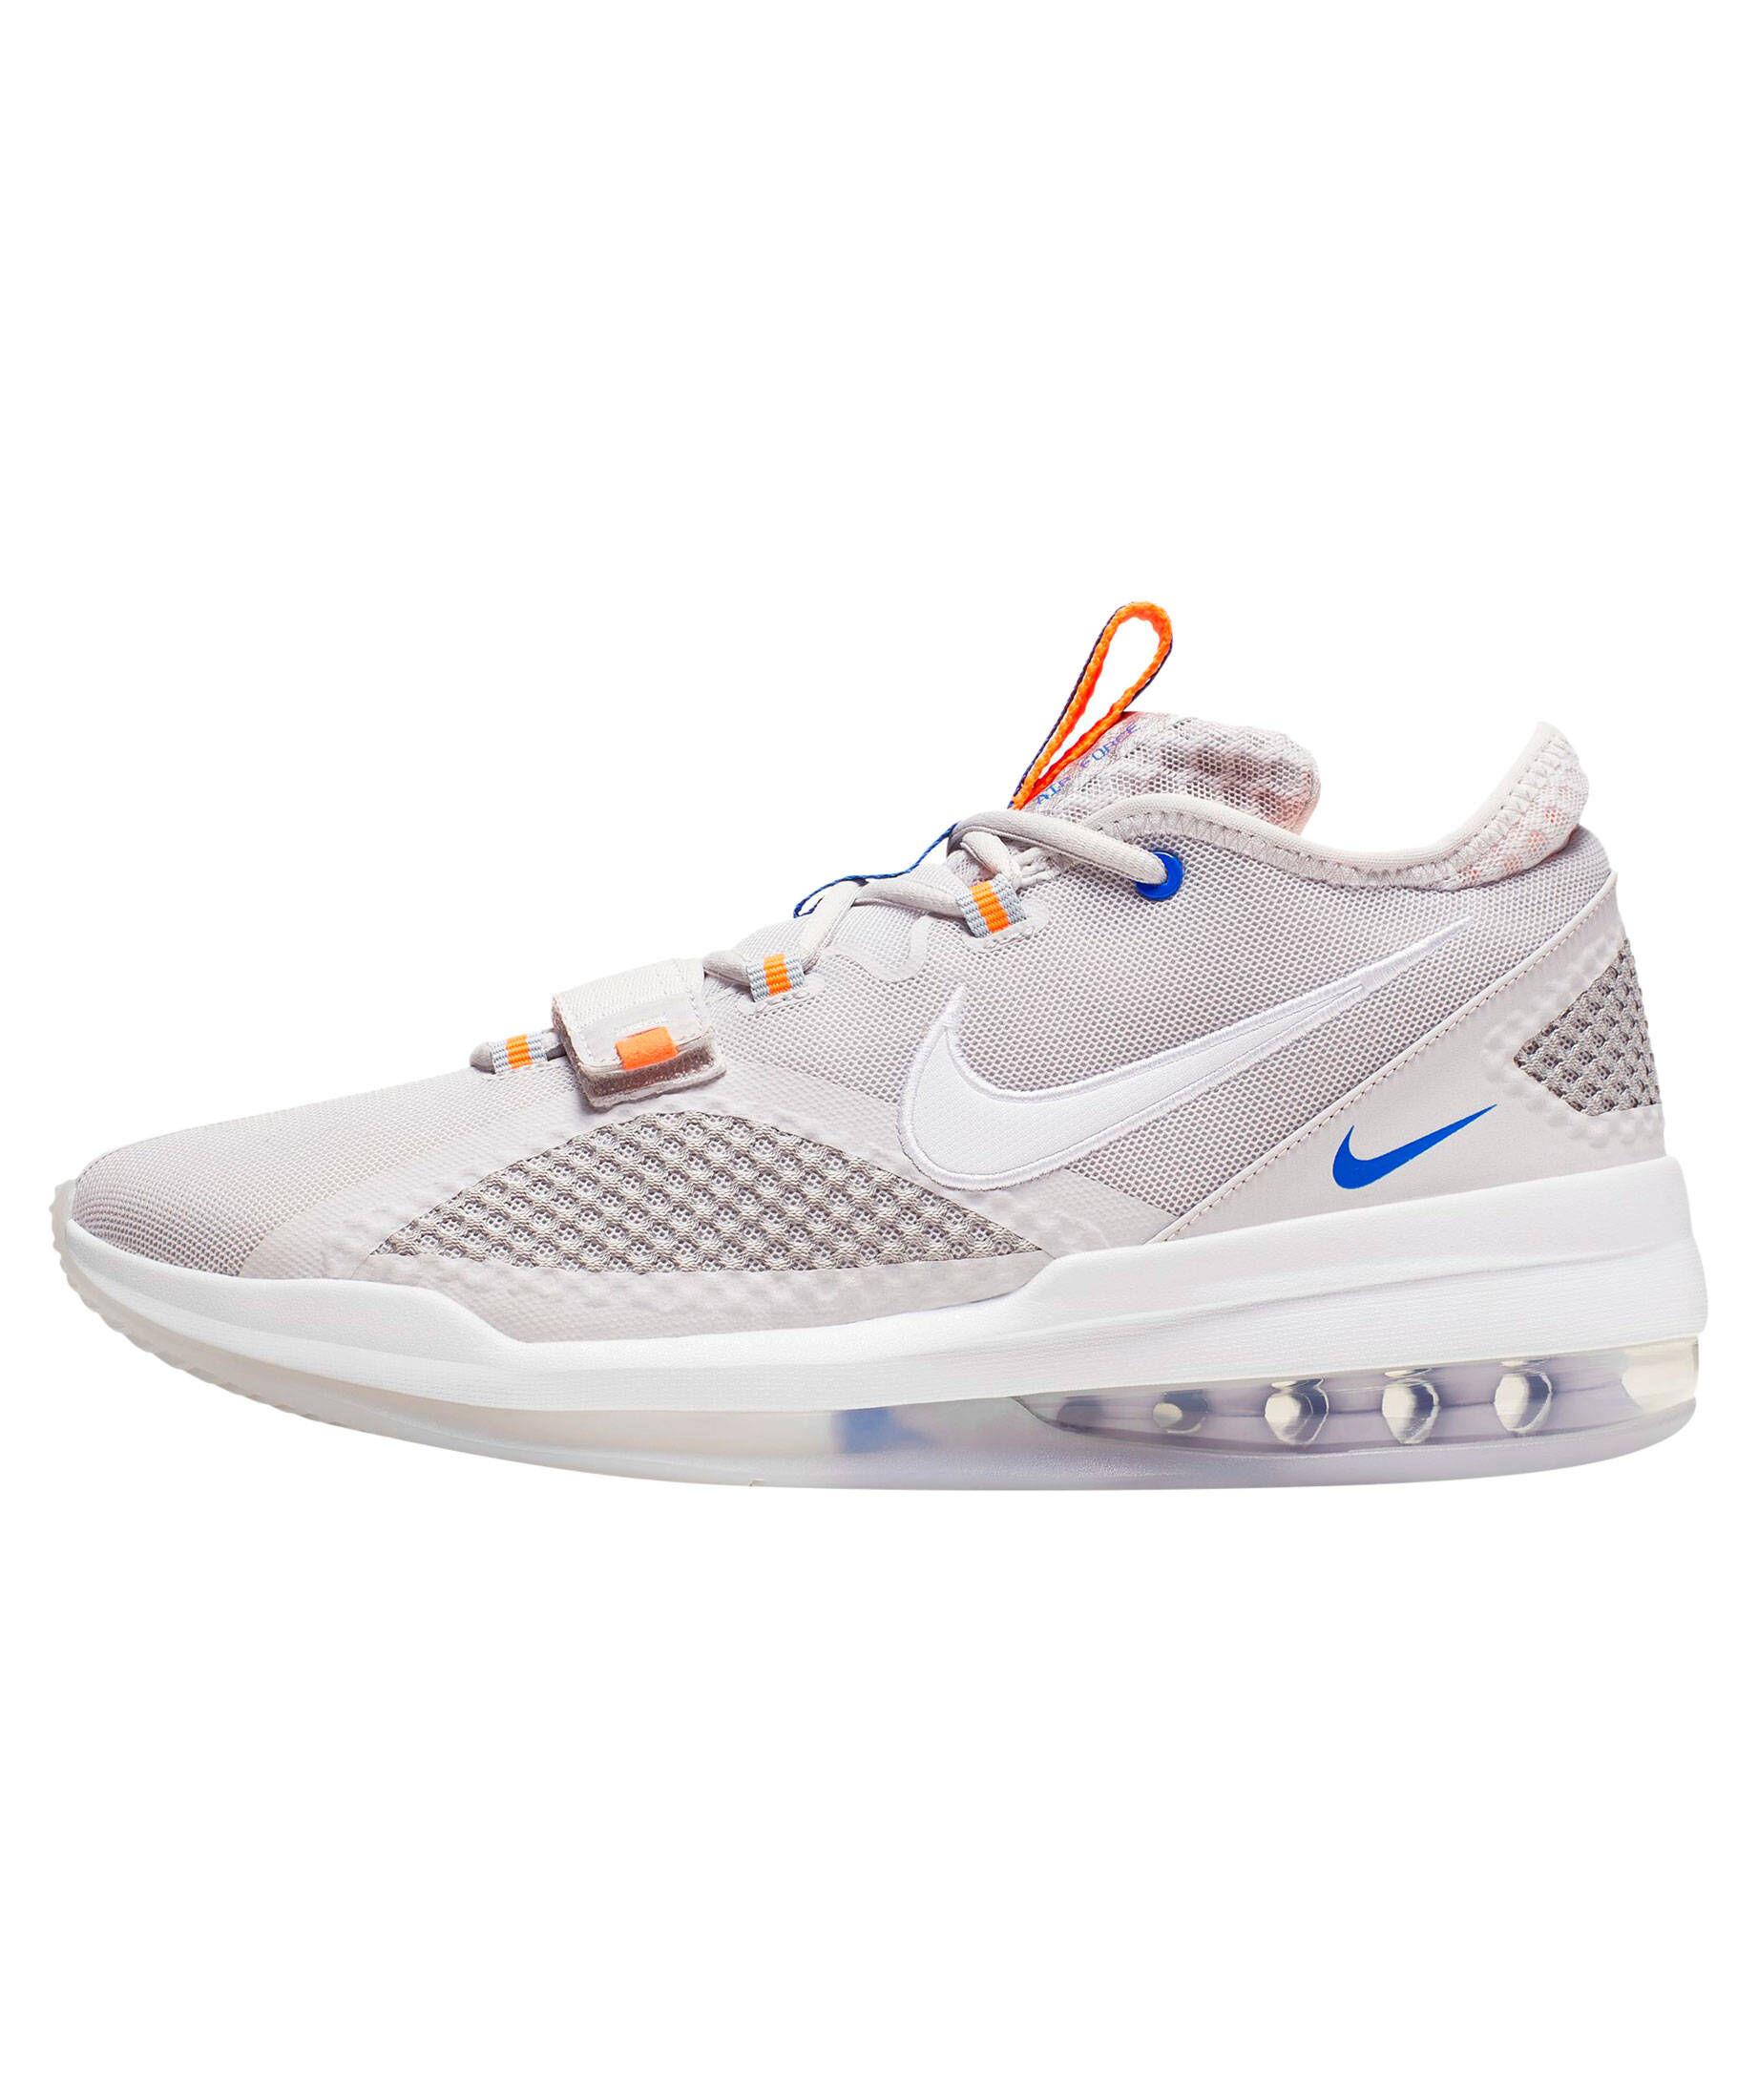 Nike Herren Sportanzge Damen Free Run 3 Nike Schuhe Damen Grau